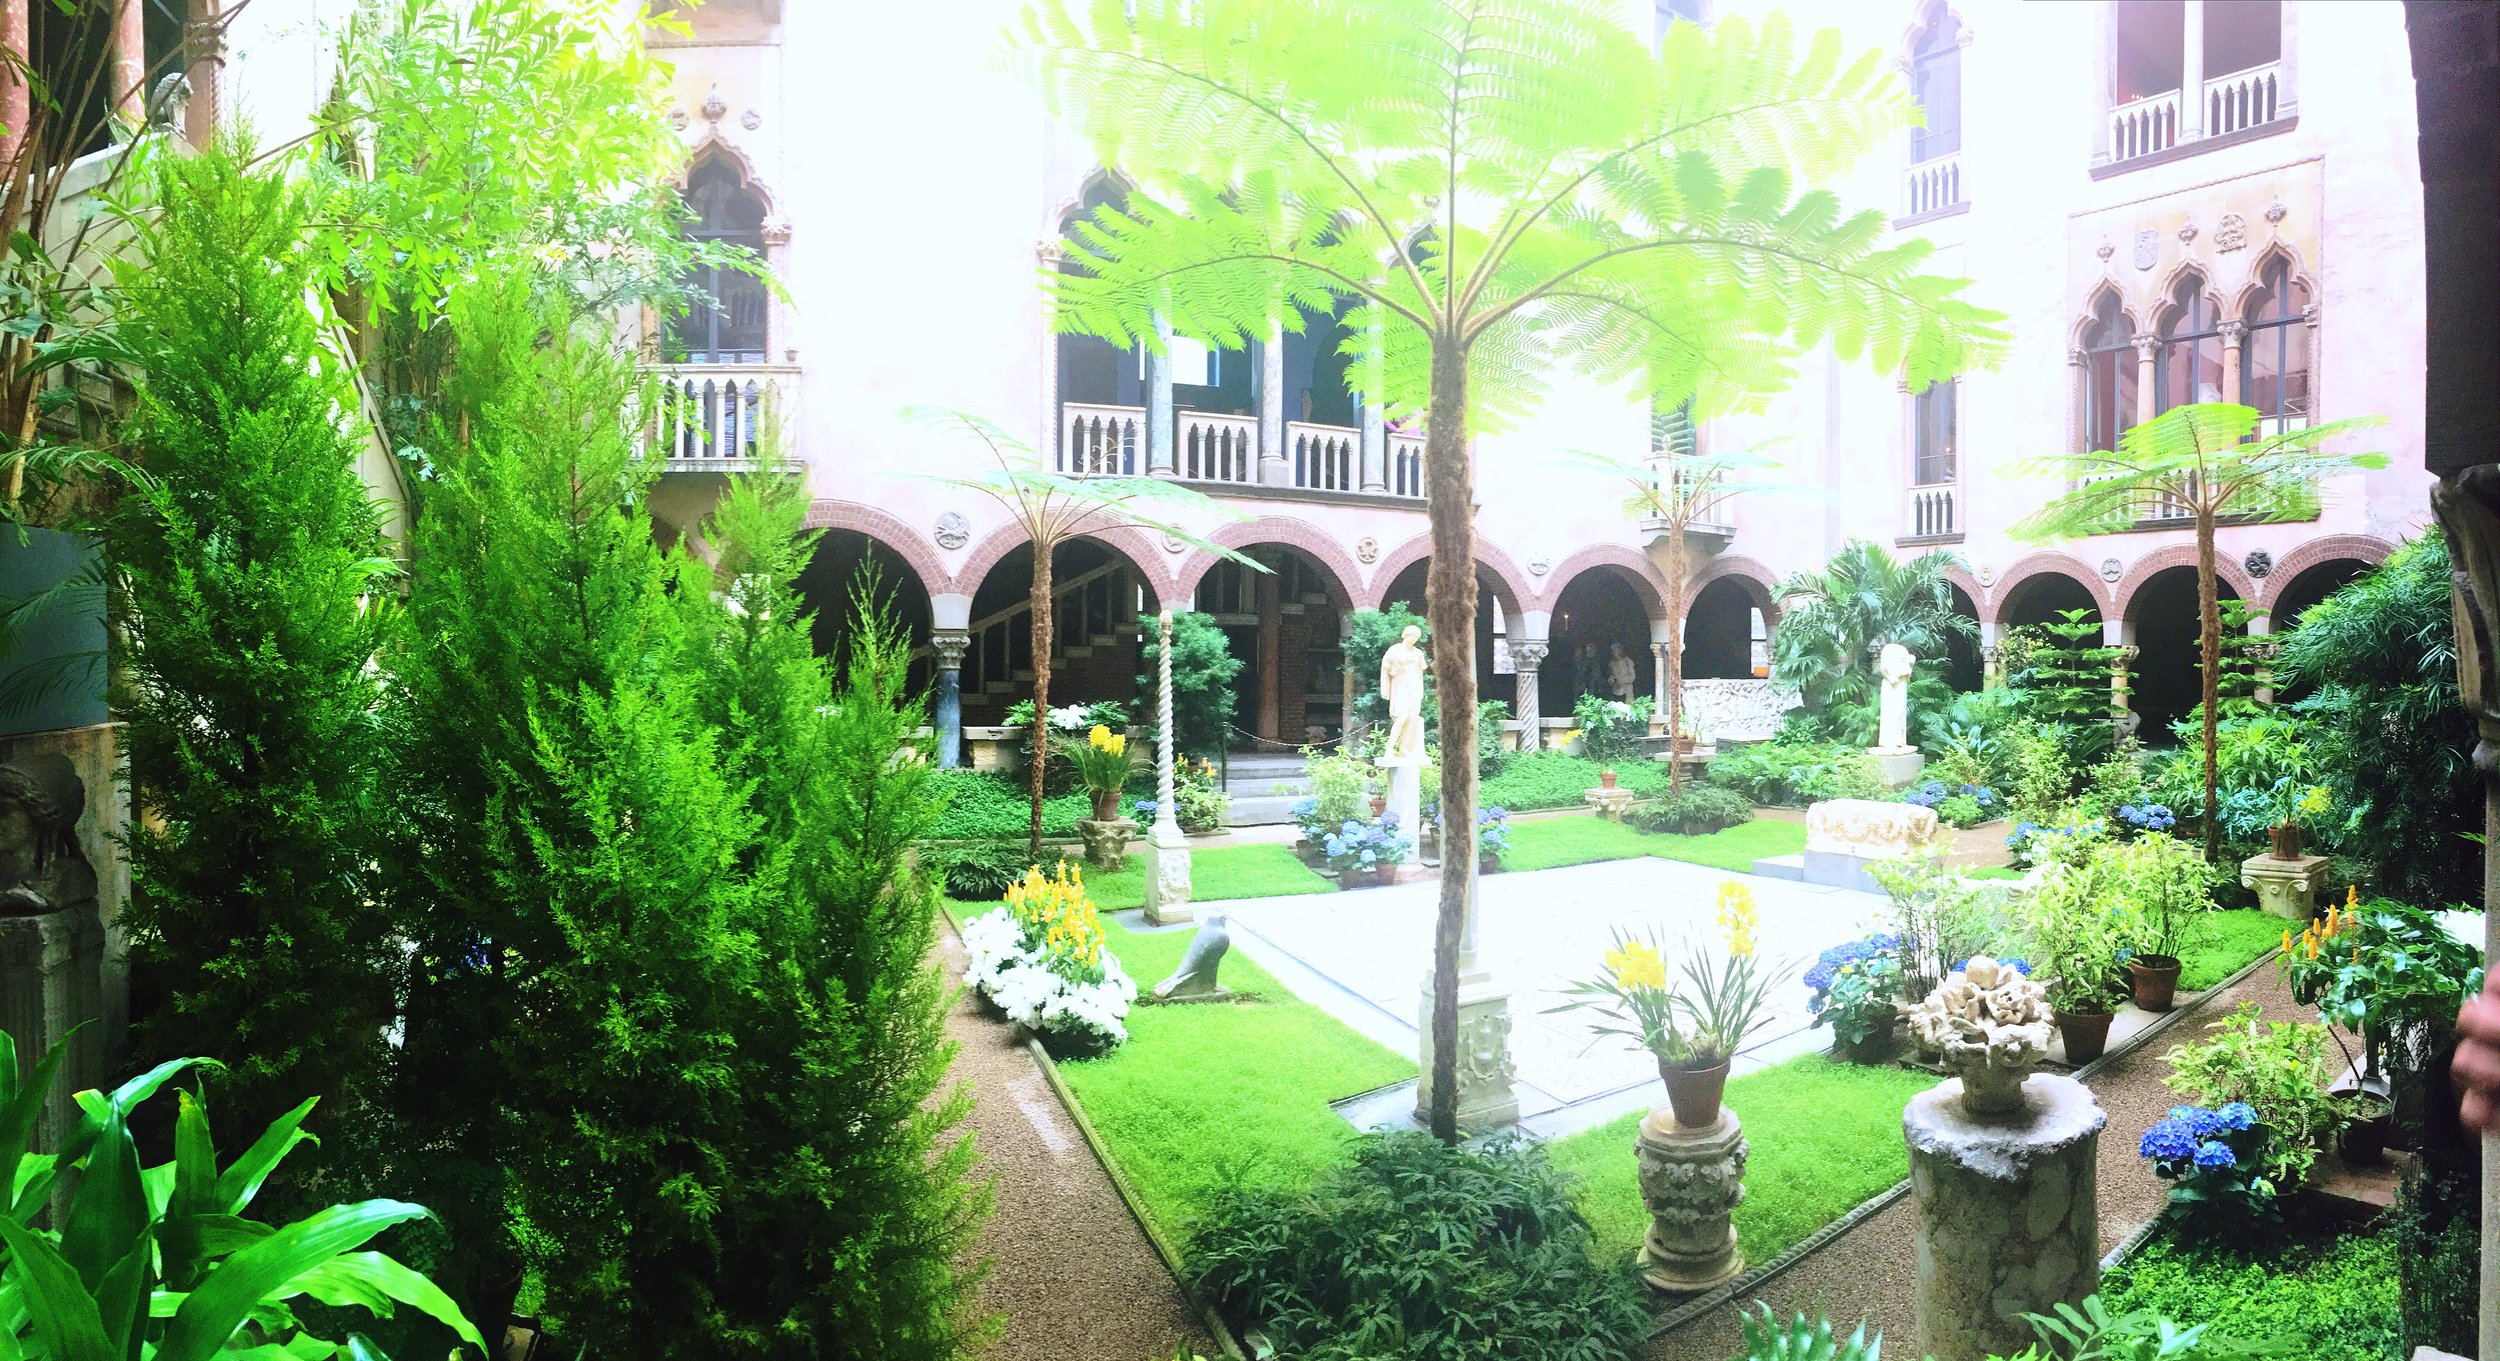 The courtyard at the Isabella Stewart Gardner Museum